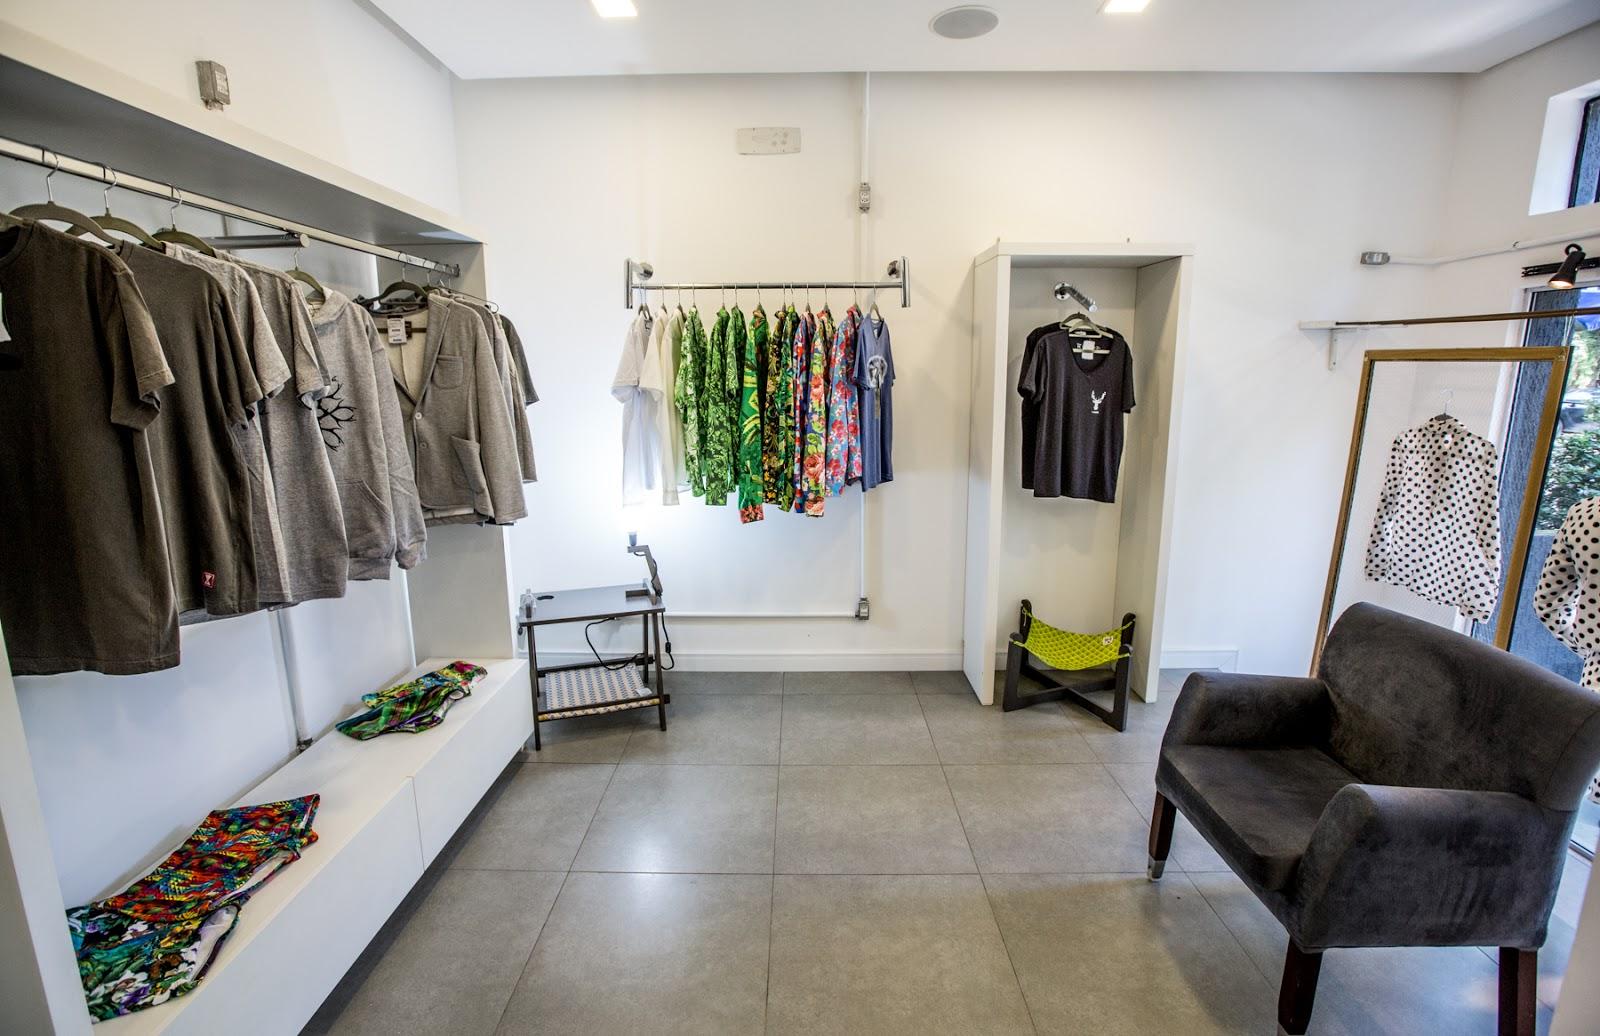 Glicks clothing store